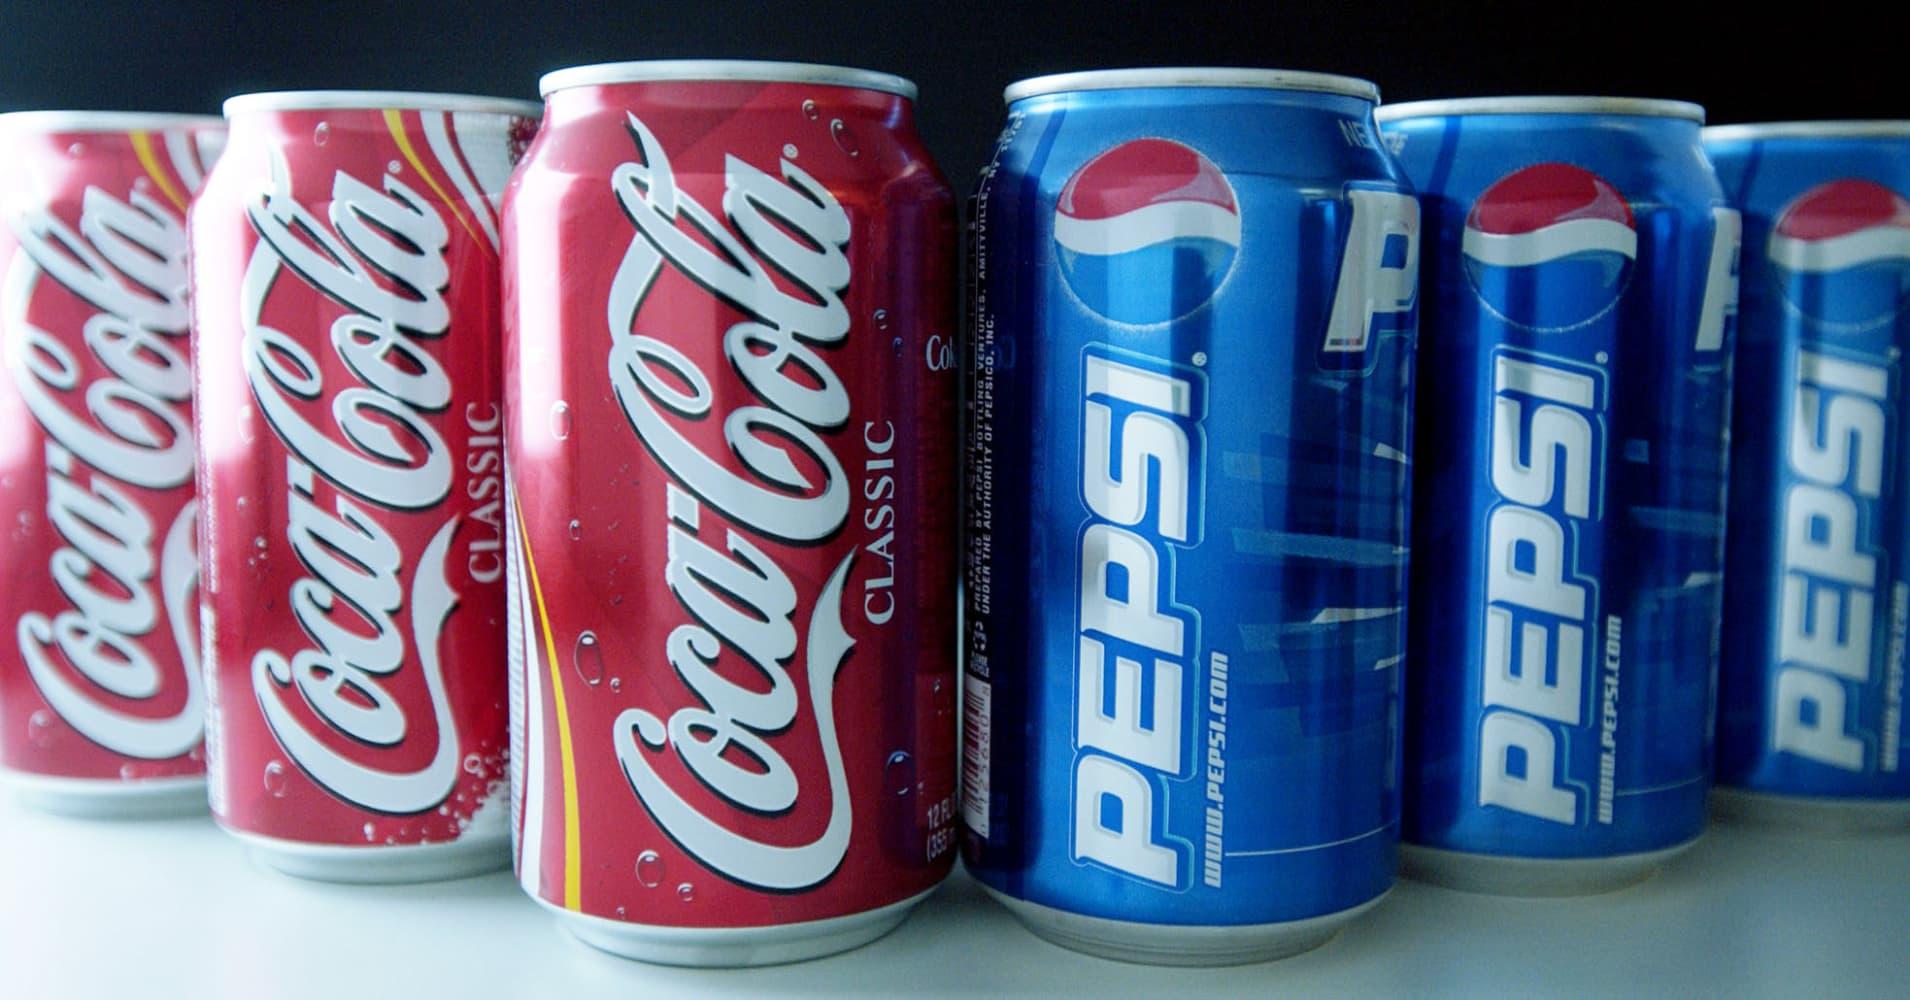 Coke or Pepsi—Which Does Cramer Prefer?